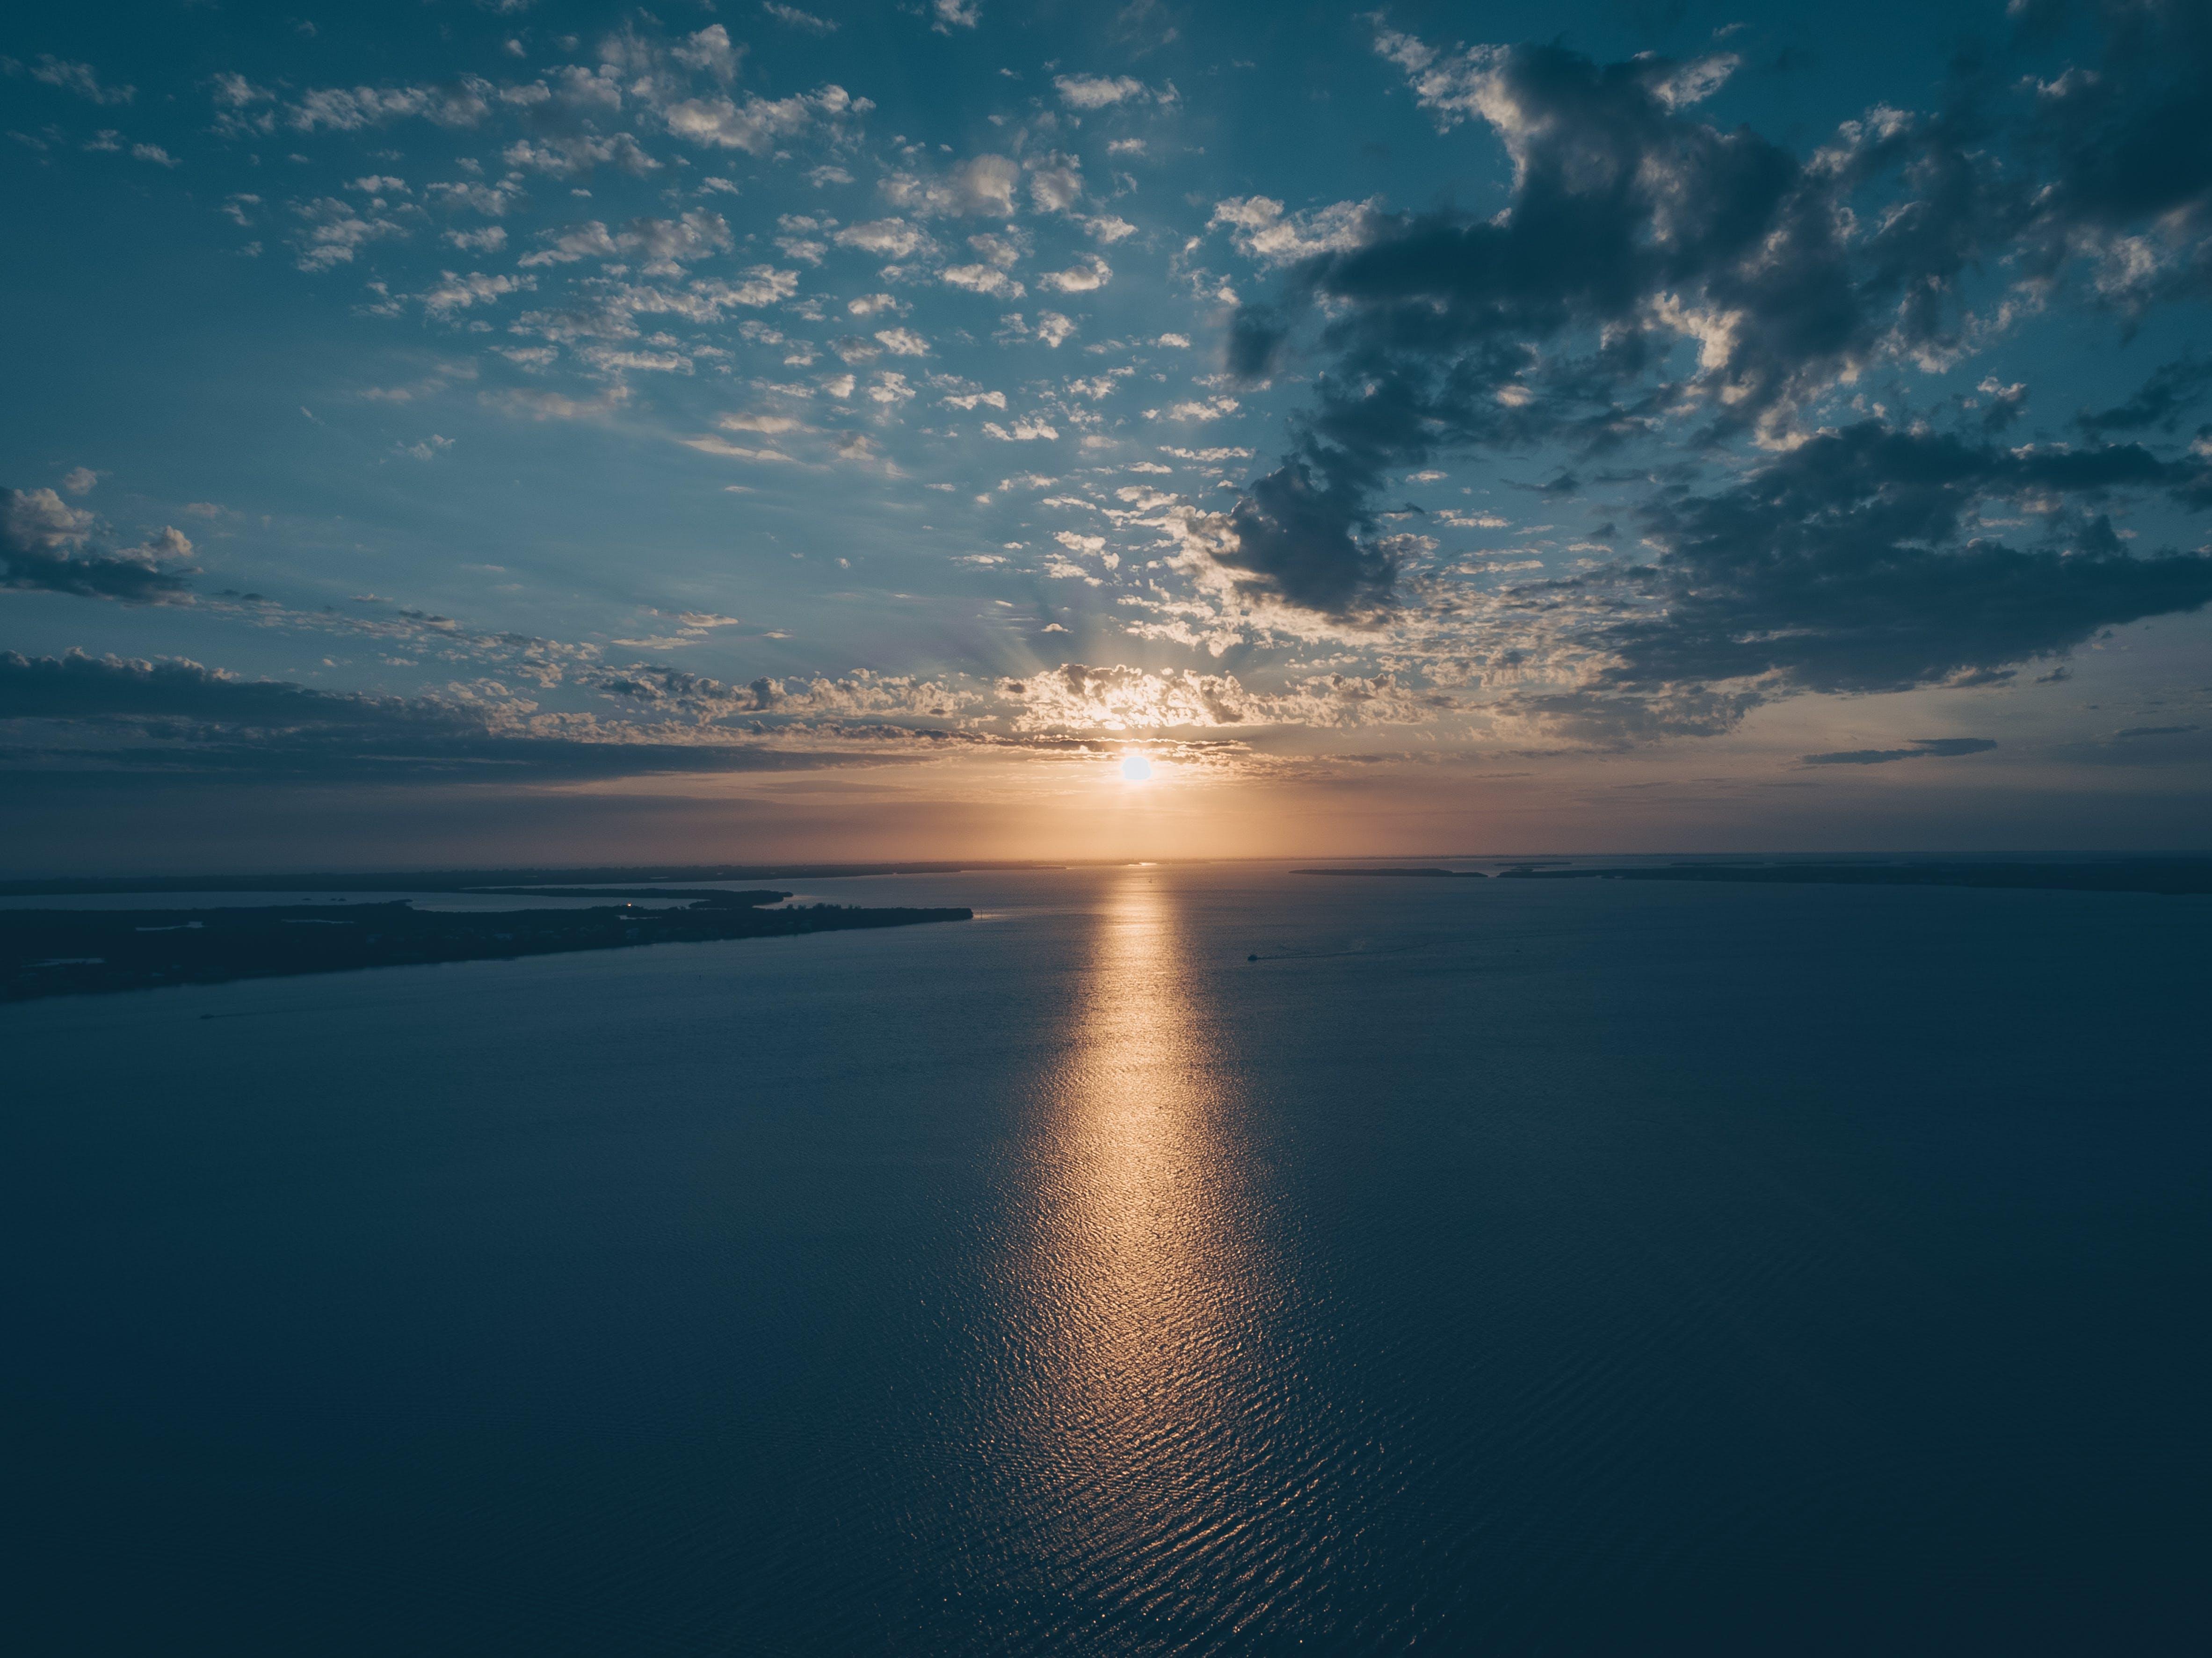 Bird's Eye View of Ocean During Sunset